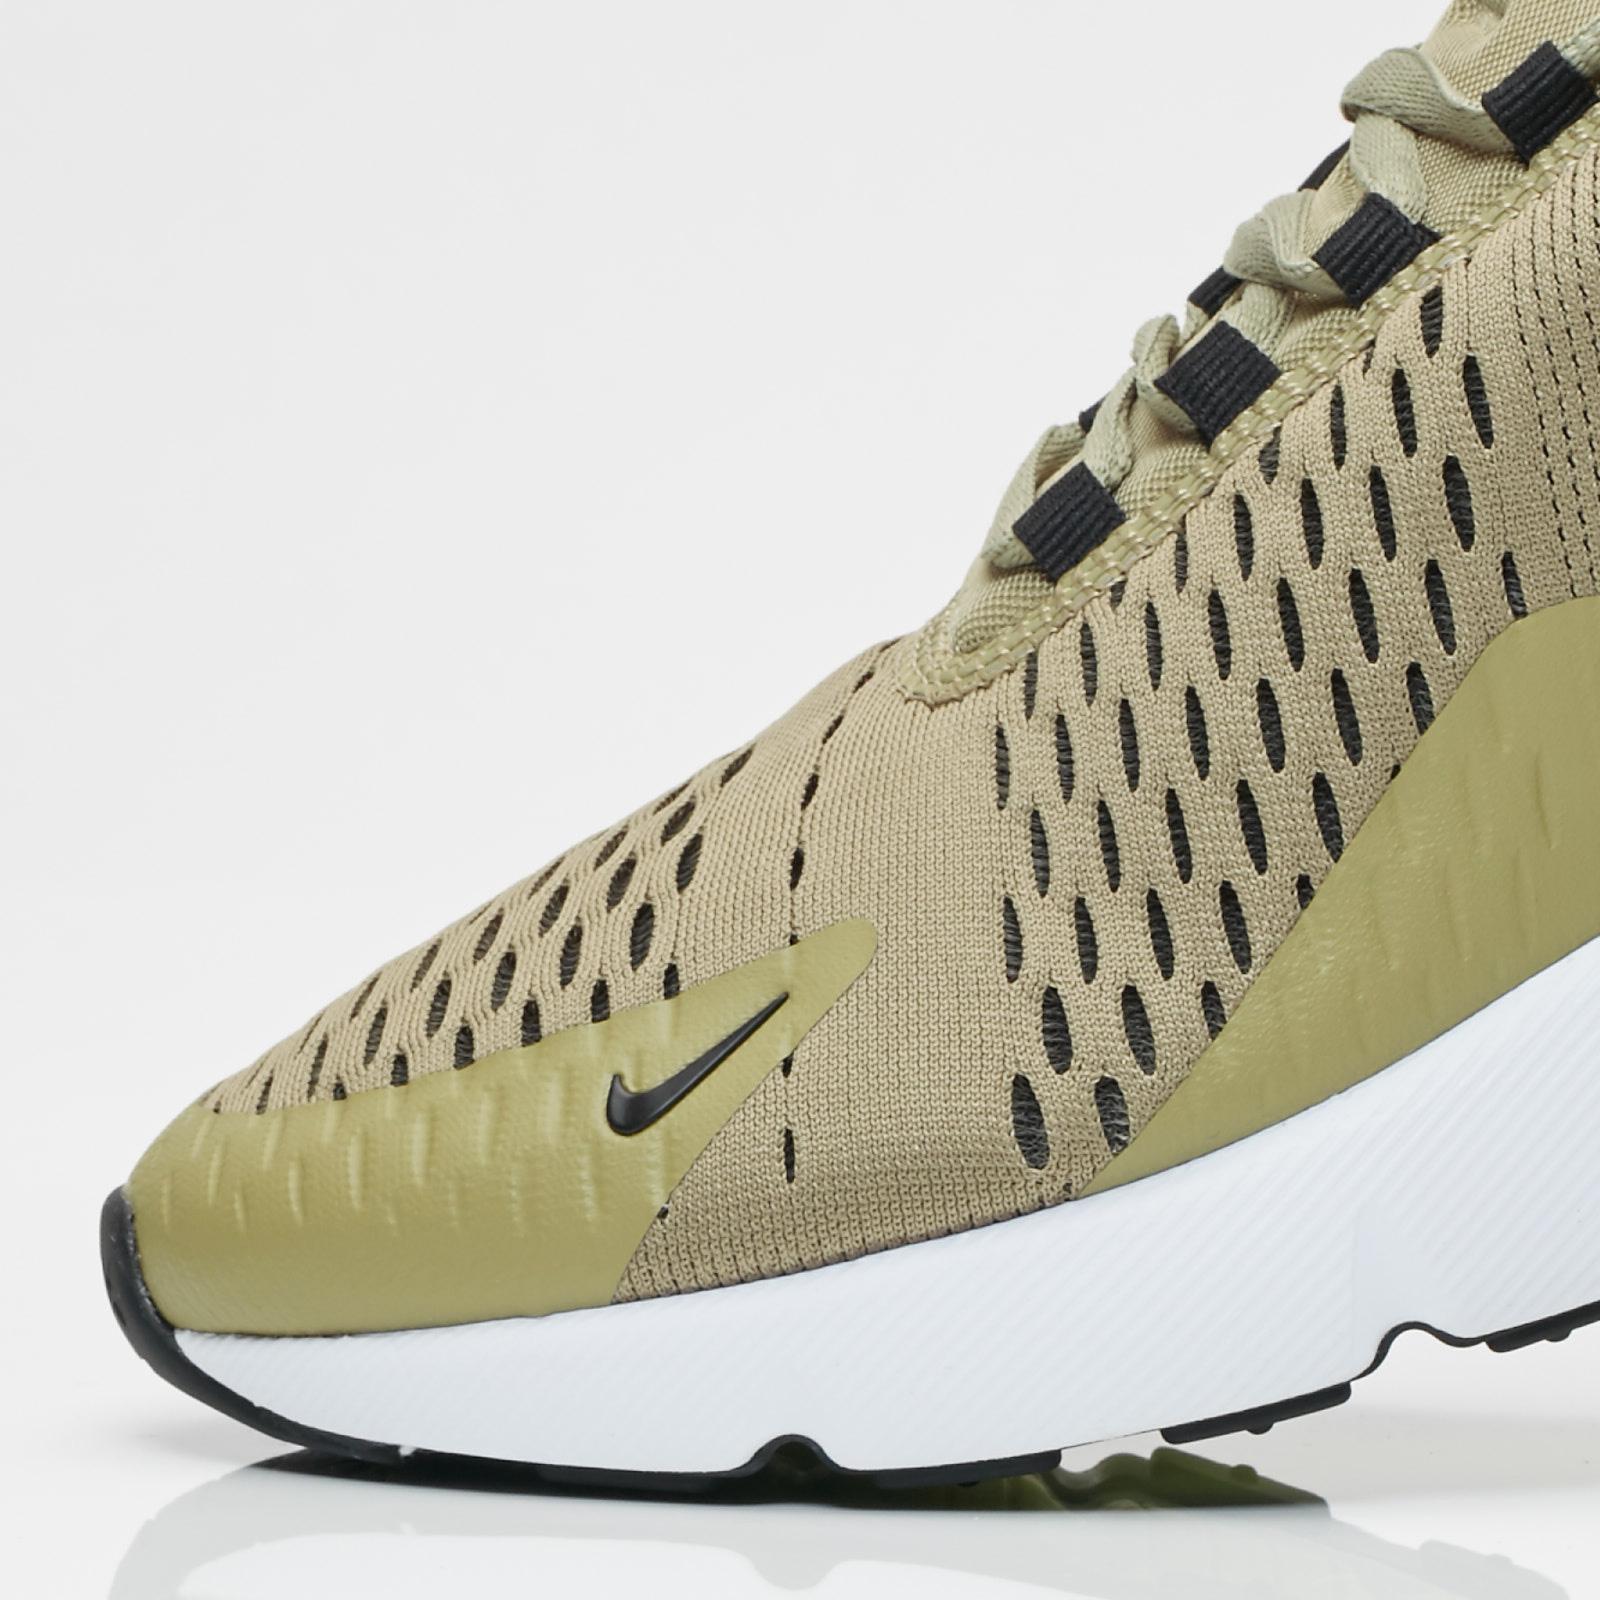 17bff0a1ff Nike Wmns Air Max 270 - Ah6789-200 - Sneakersnstuff | sneakers ...